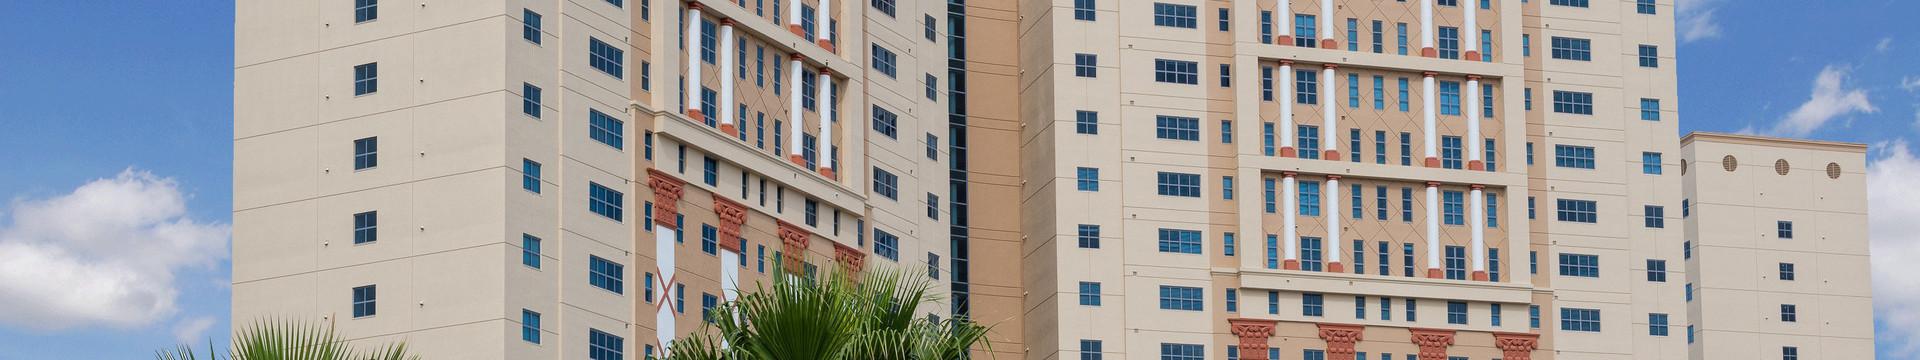 Orlando Hotel Deals Near Universal Studios | Hotel Discounts Near International Drive, Orlando, FL 32819